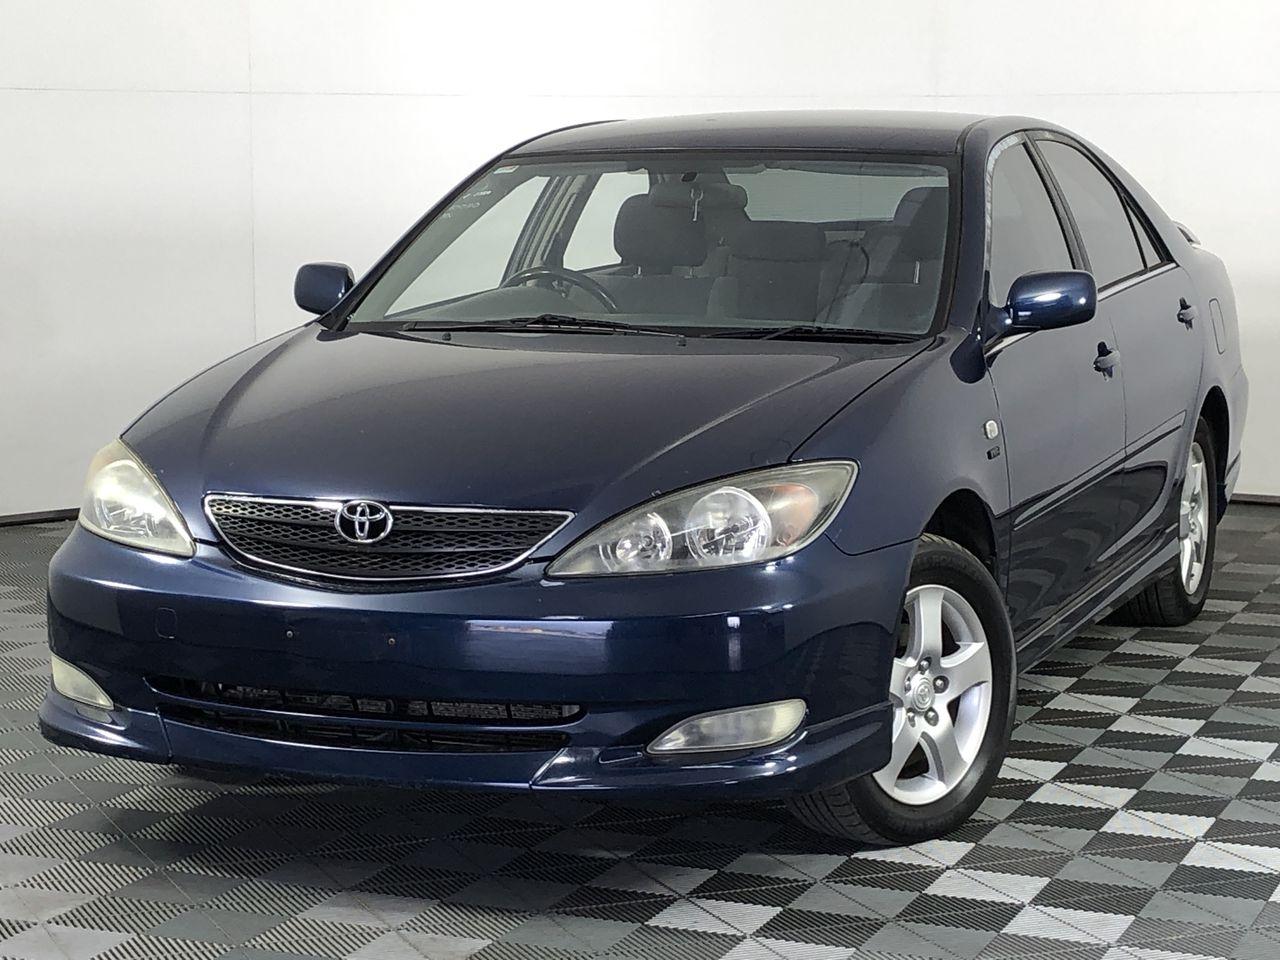 2004 Toyota Camry Sportivo ACV36R Manual Sedan